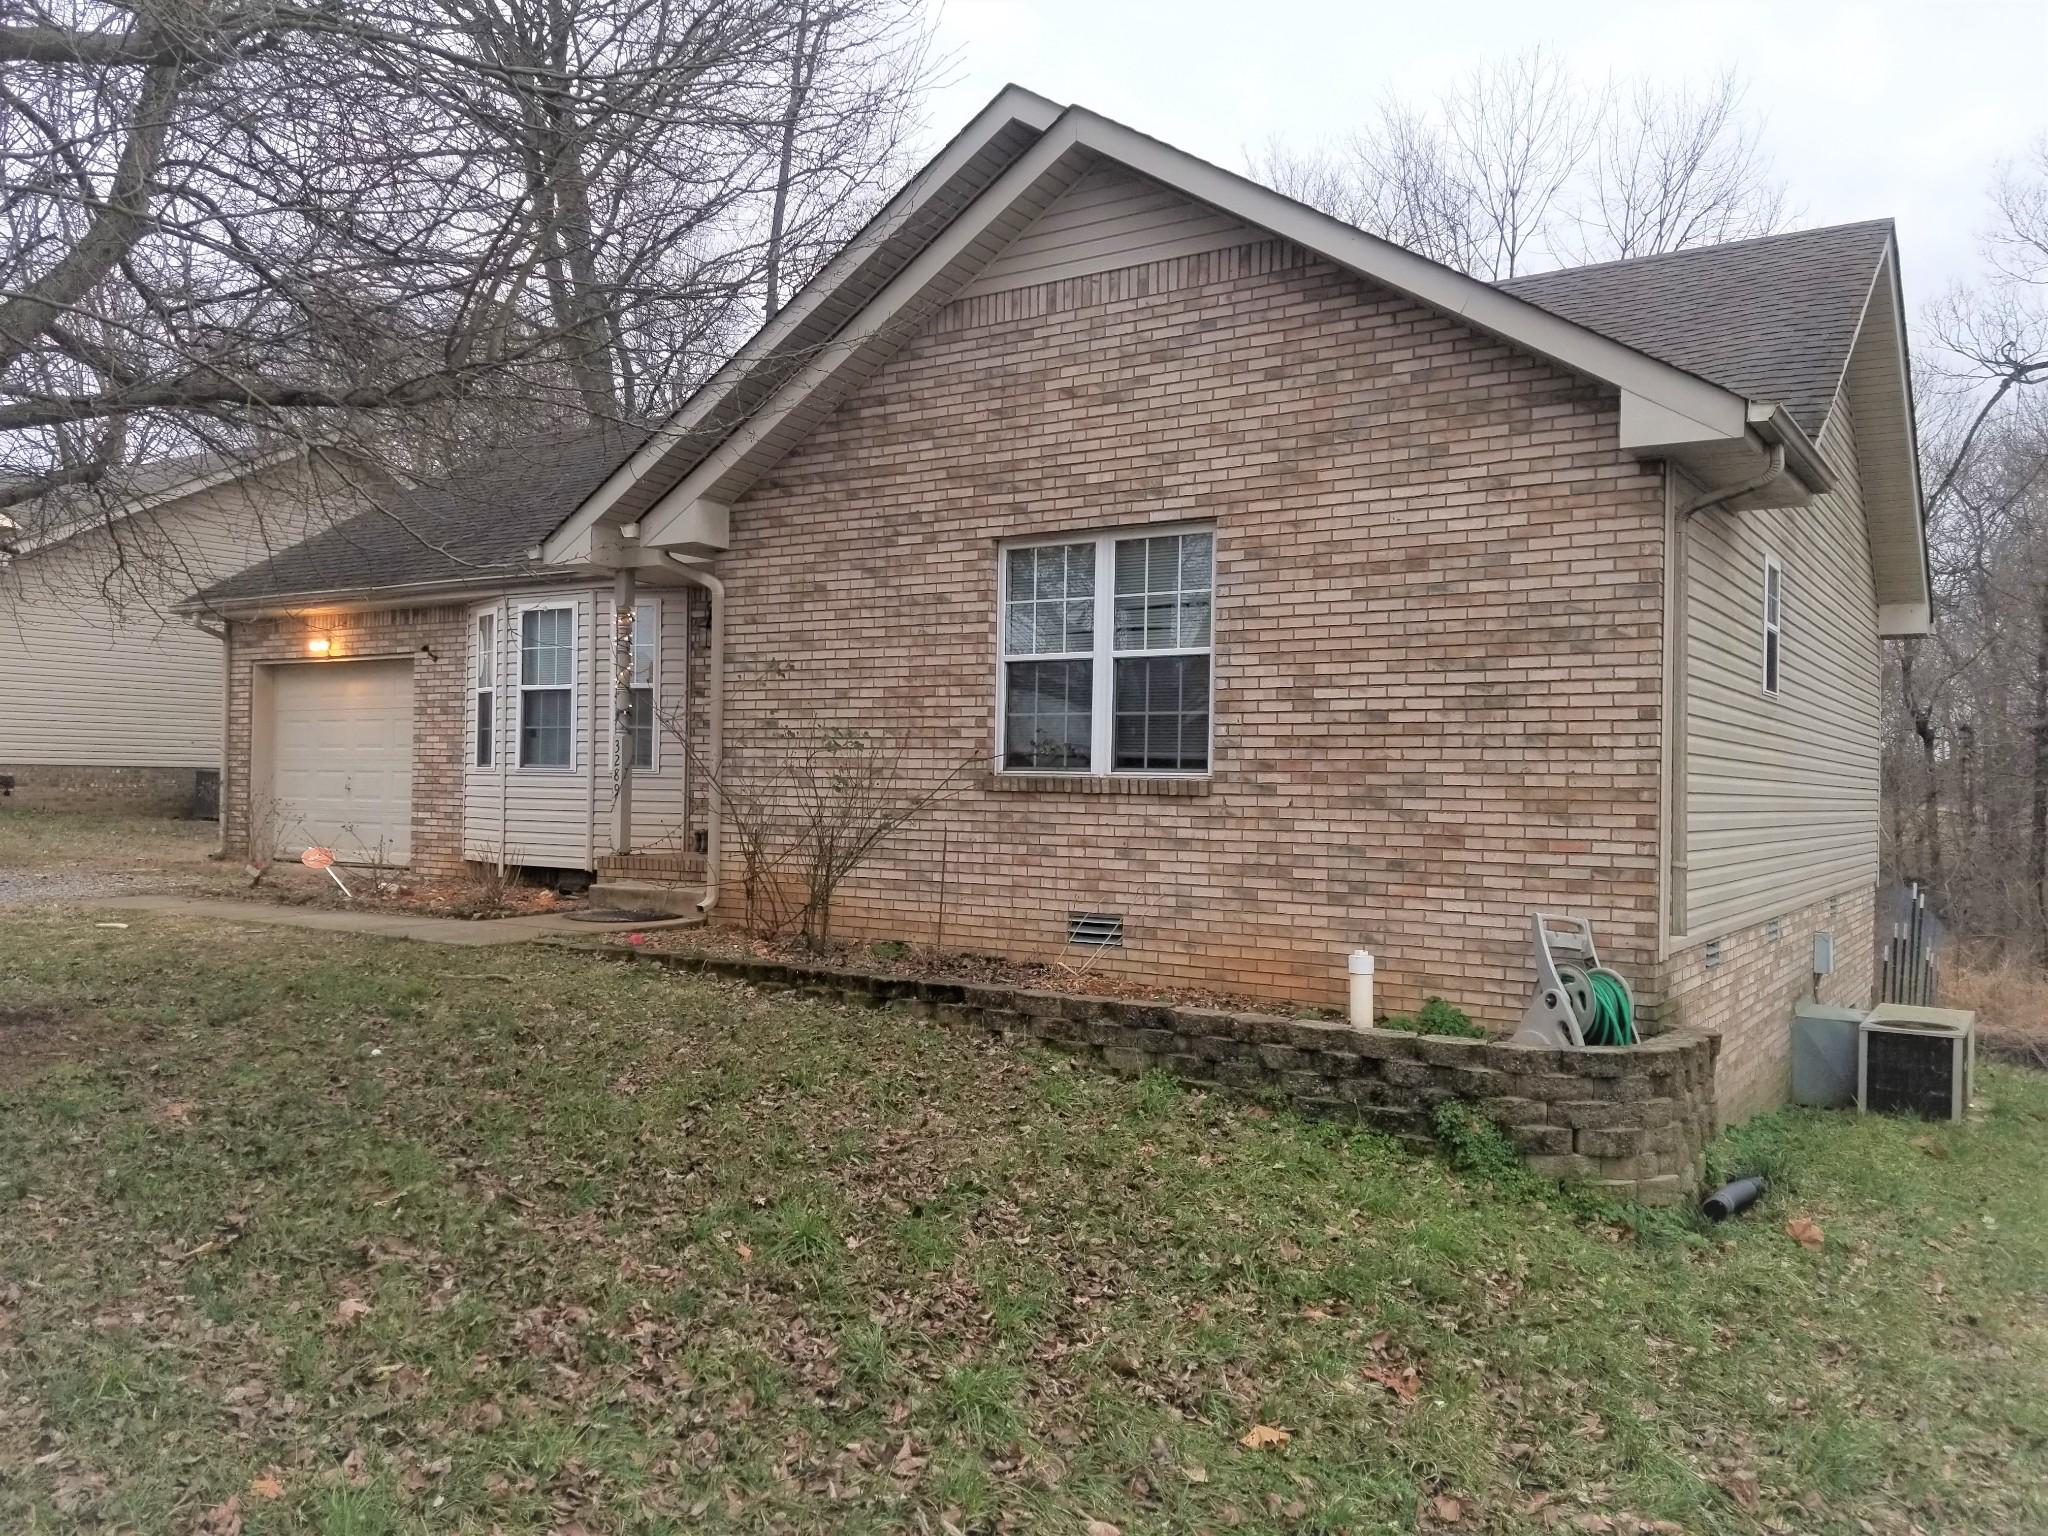 3289 N Senseney Cir Property Photo - Clarksville, TN real estate listing